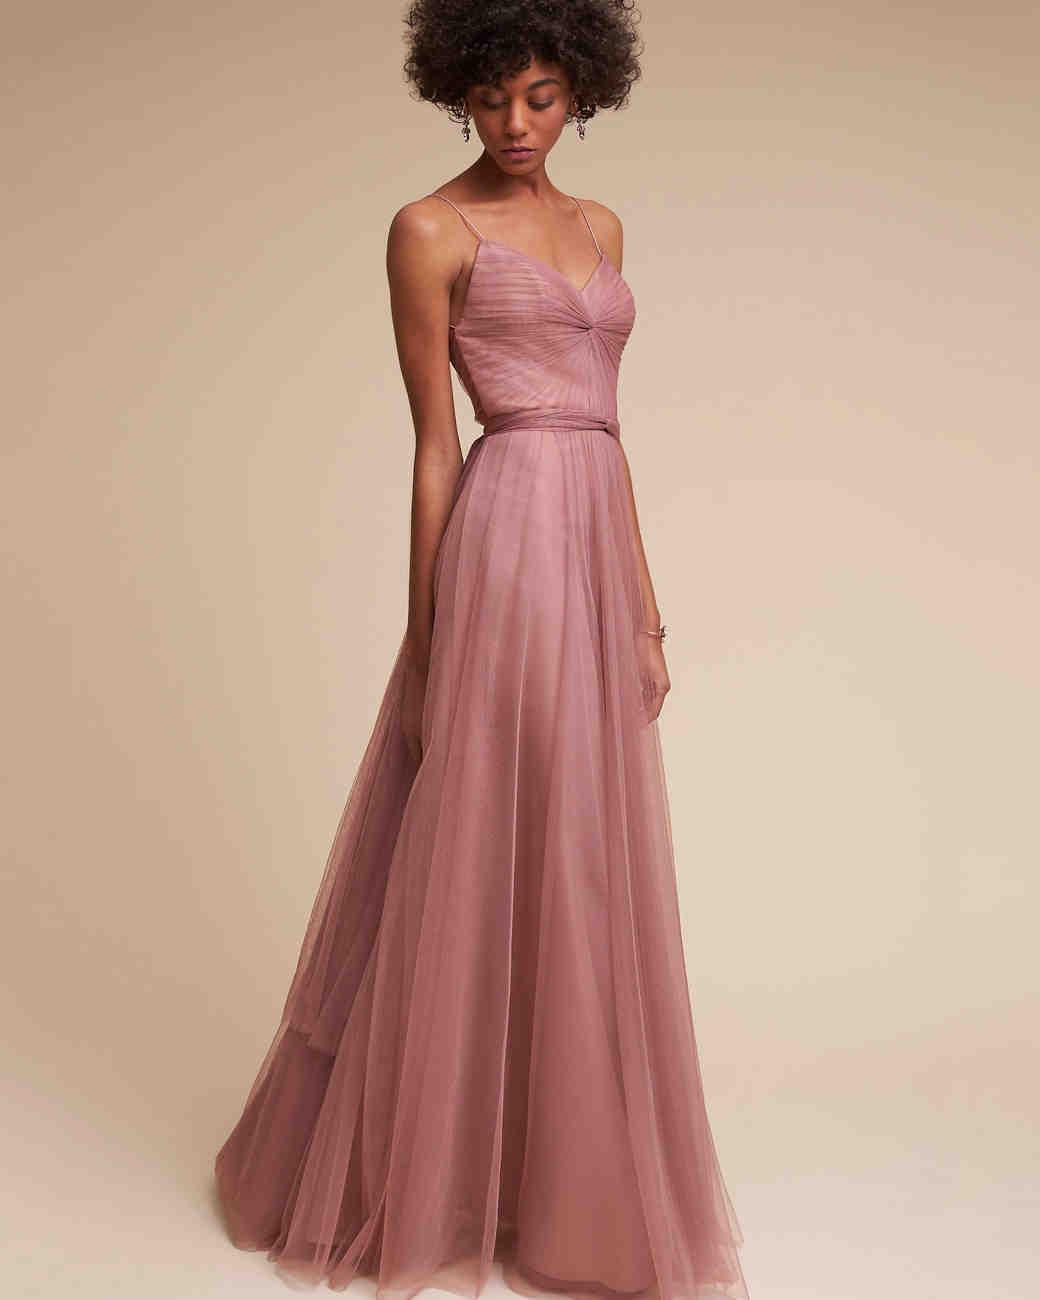 Spaghetti Strap Bridesmaid Dresses | Martha Stewart Weddings